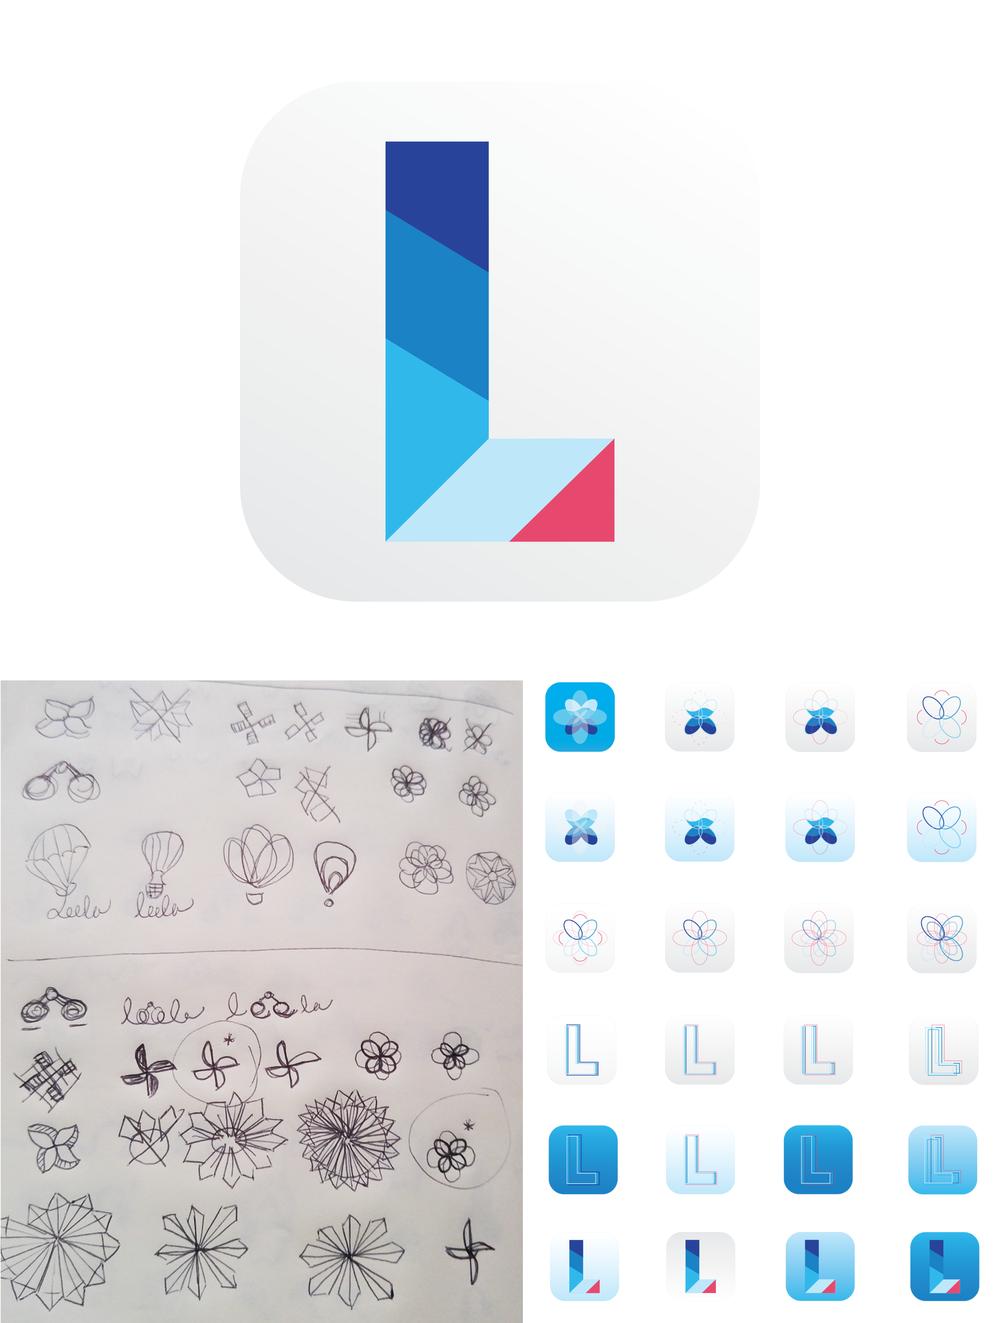 Leela Podcast & Discovery App icon